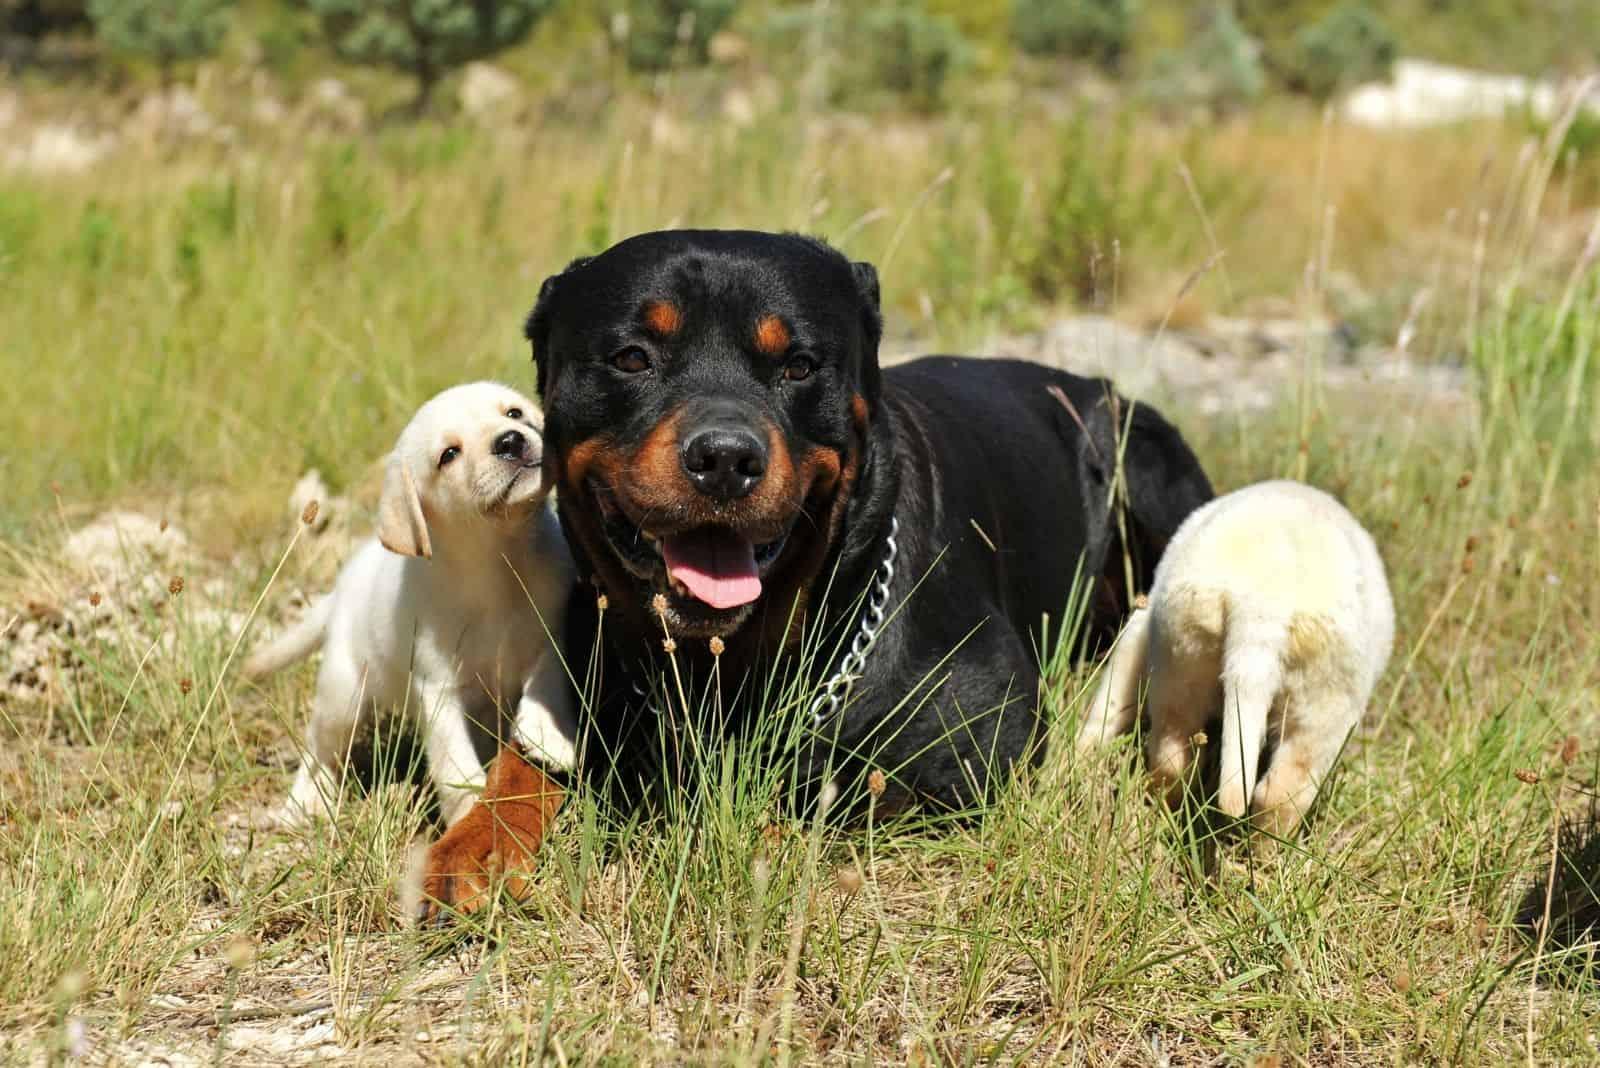 rottweiler sat in the field with labrador puppies around